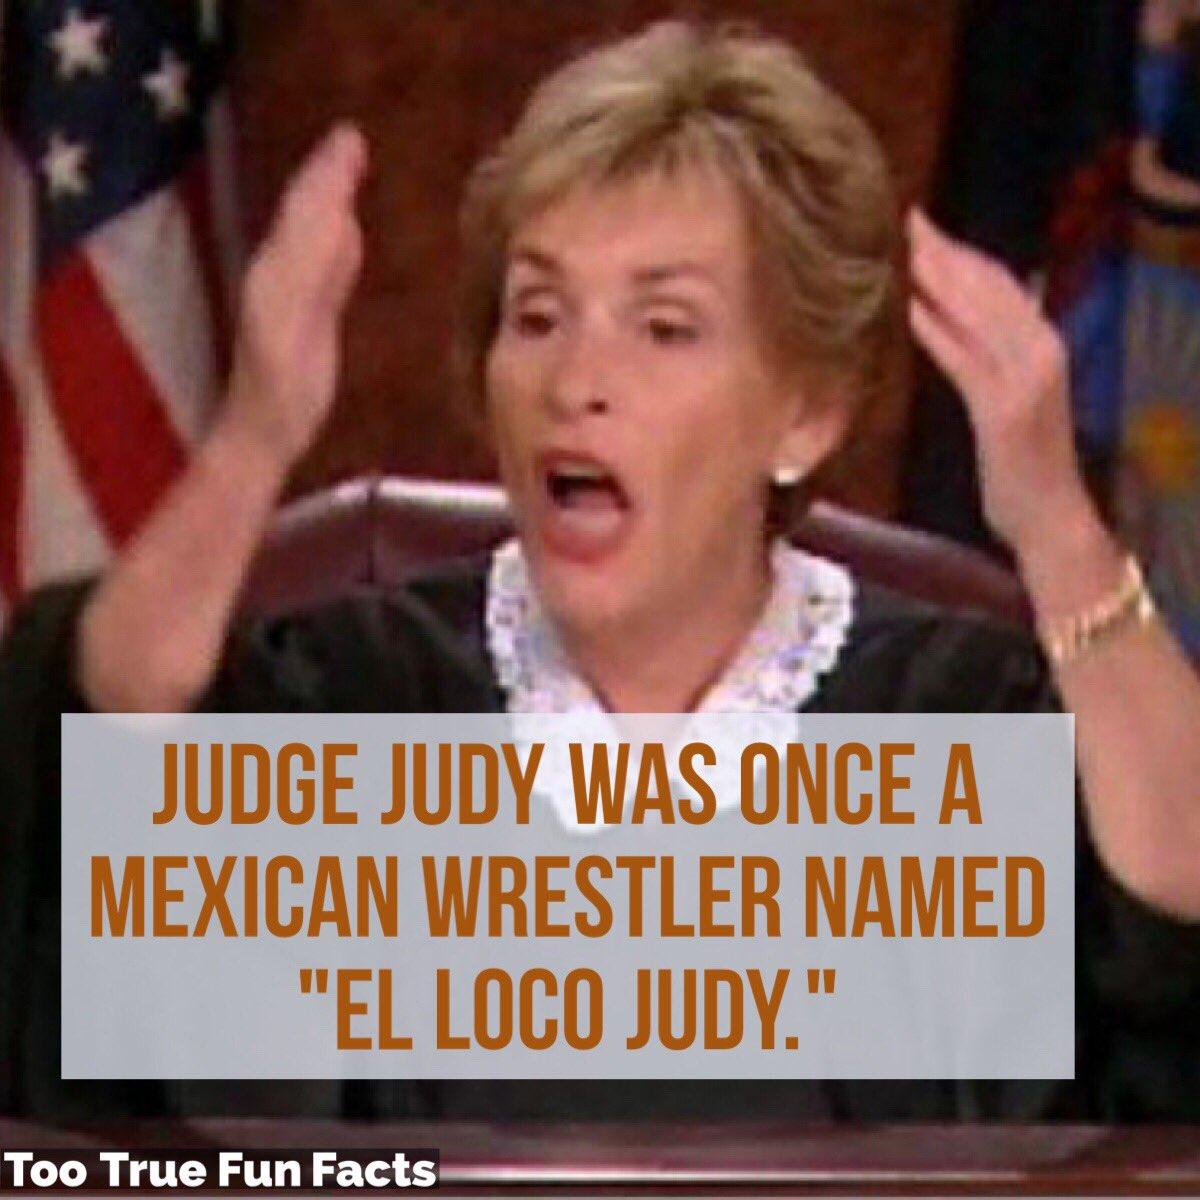 Judge Judy Fun Fact. #JudgeJudy #TVseries #TVShows #TV #wrestling #wrestler #Mexican #LuchaLibre #comedy #funny #meme #memes #parody #satire<br>http://pic.twitter.com/sQHOWGCALW